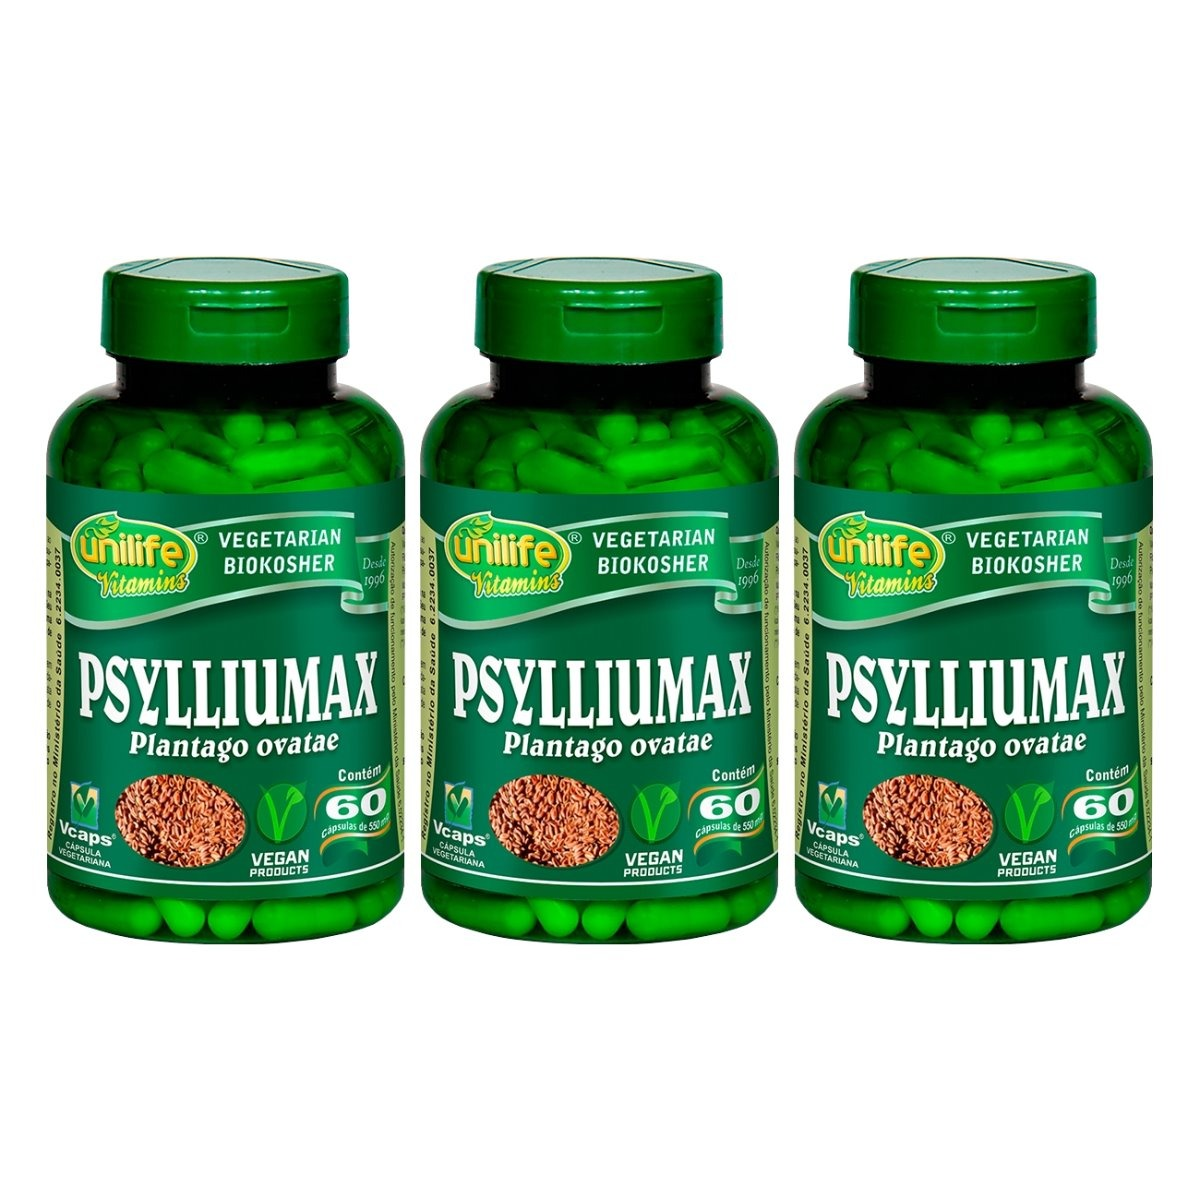 Psylliumax Psyllium 60 Cápsulas 550mg Unilife Kit 3 Unidades